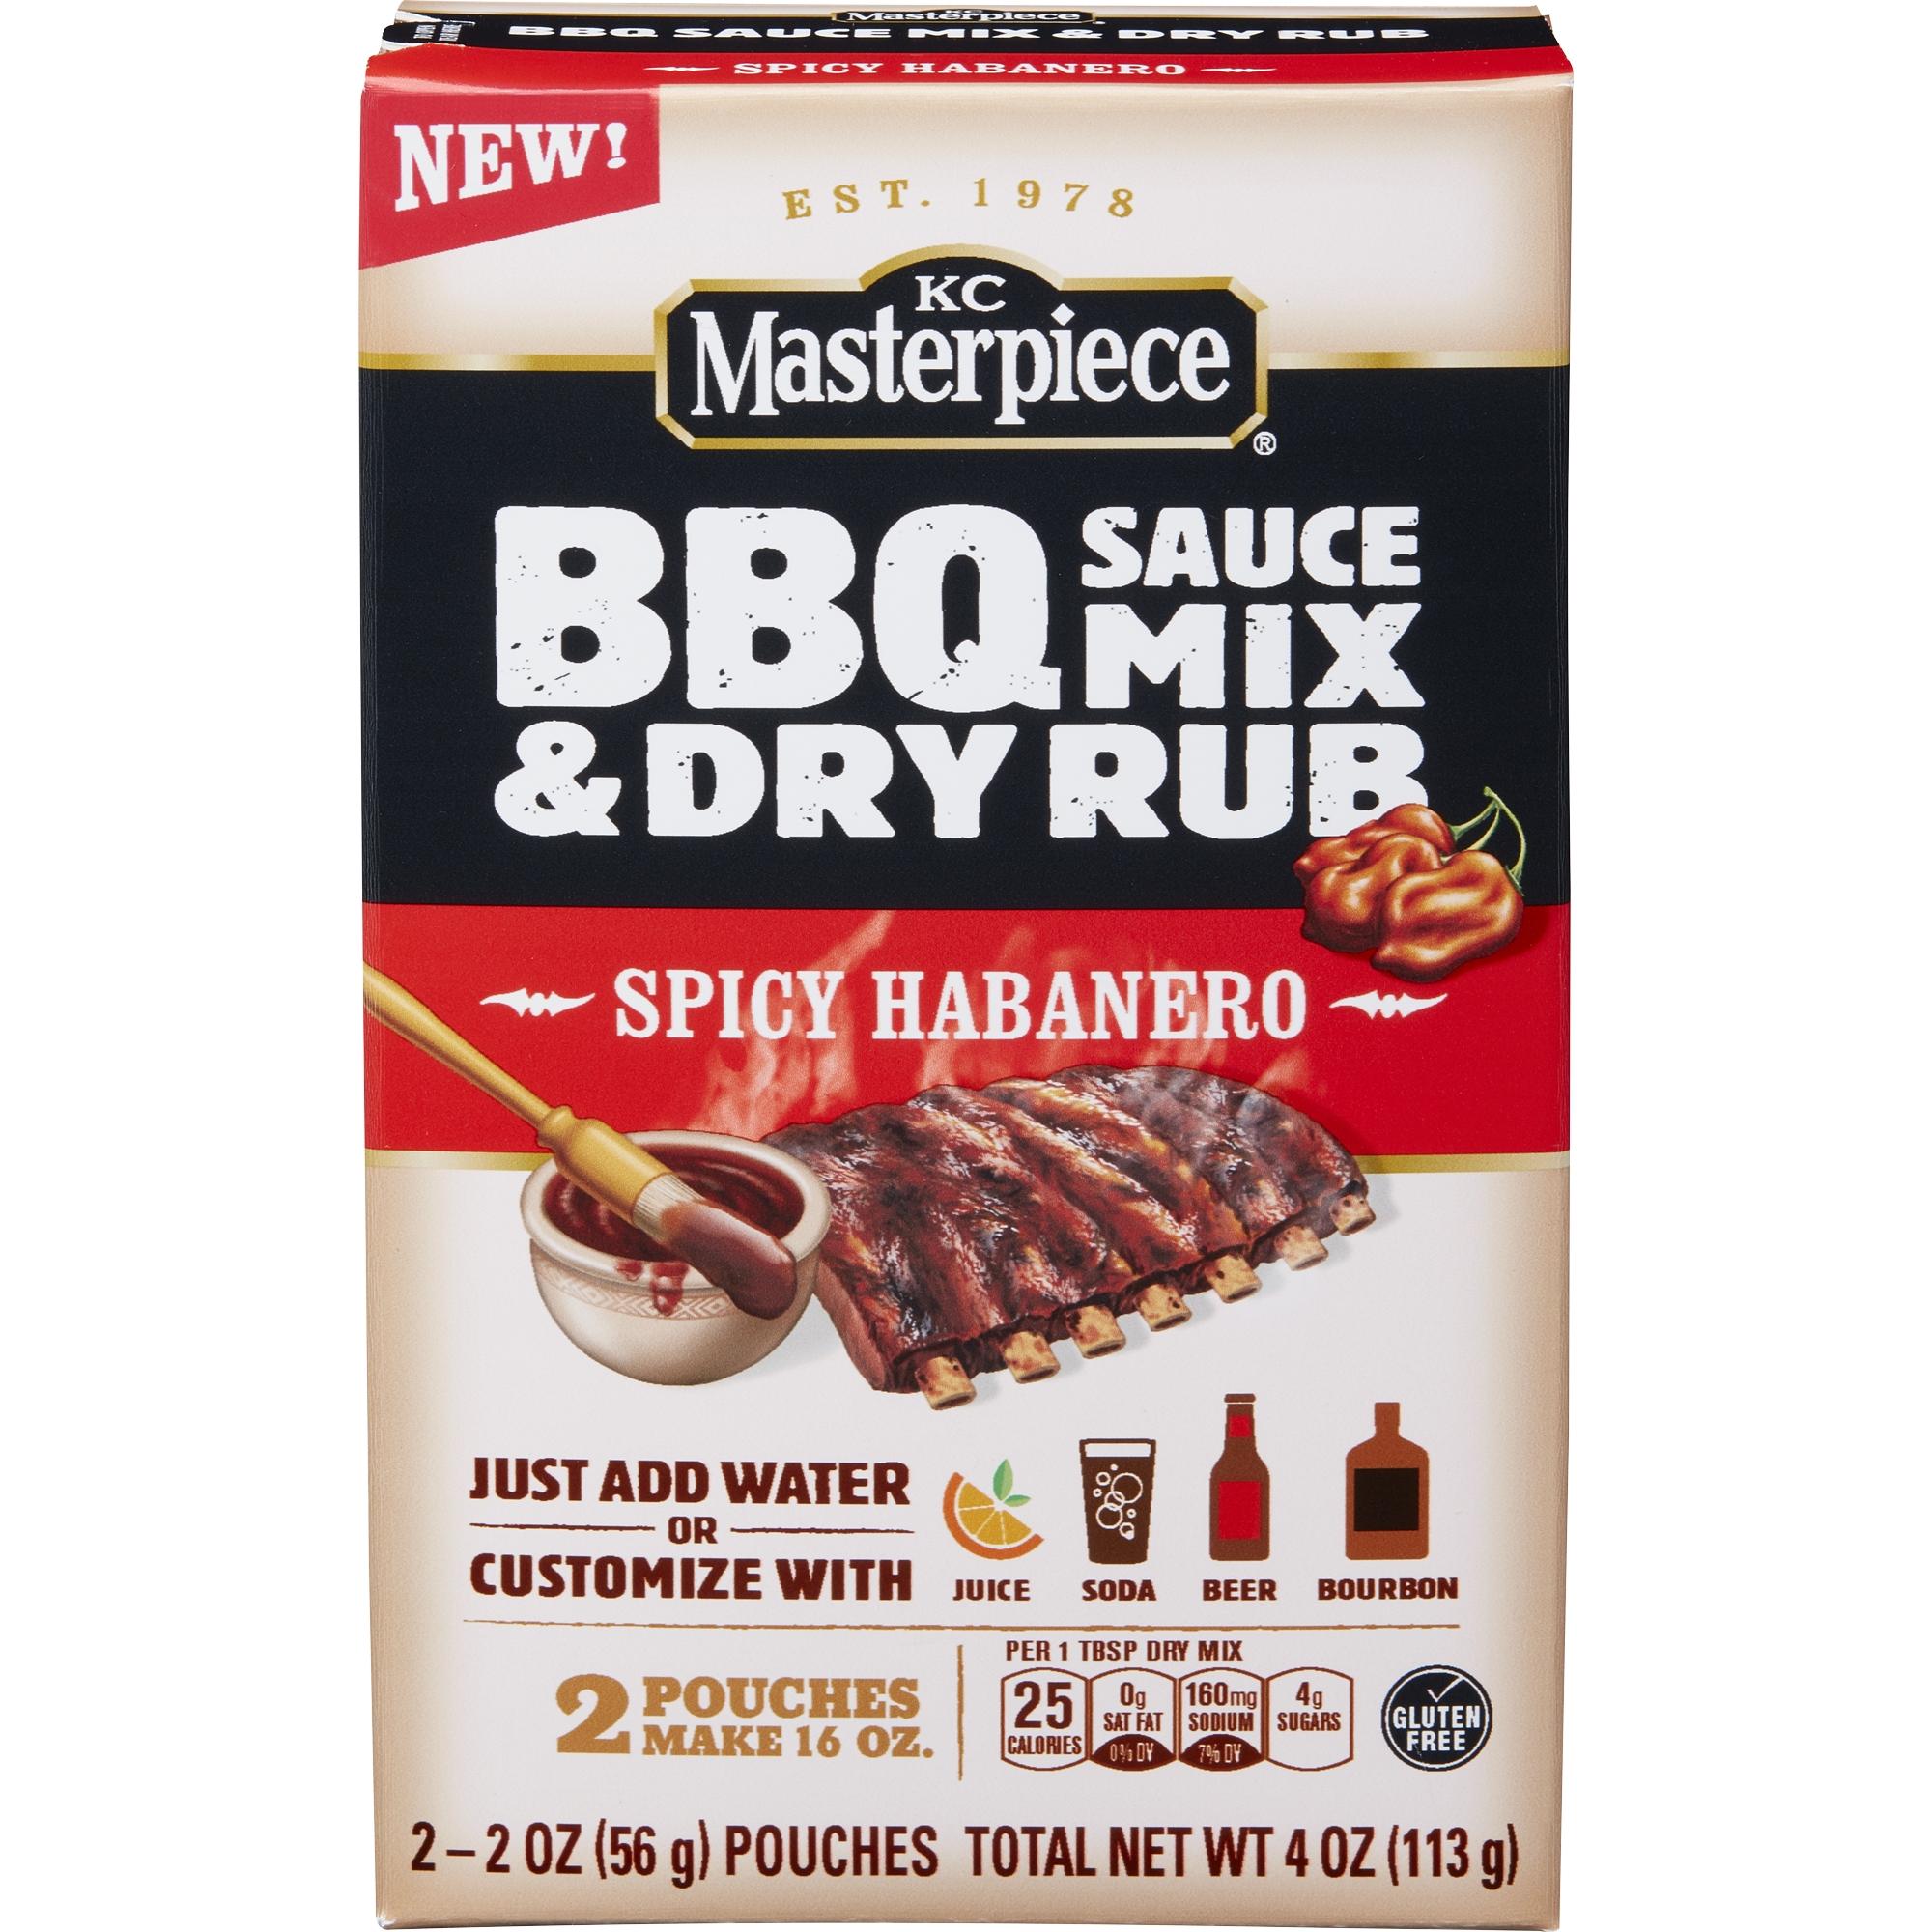 Kc masterpiece bbq sauce mix & dry rub, spicy habanero, 4 ounces